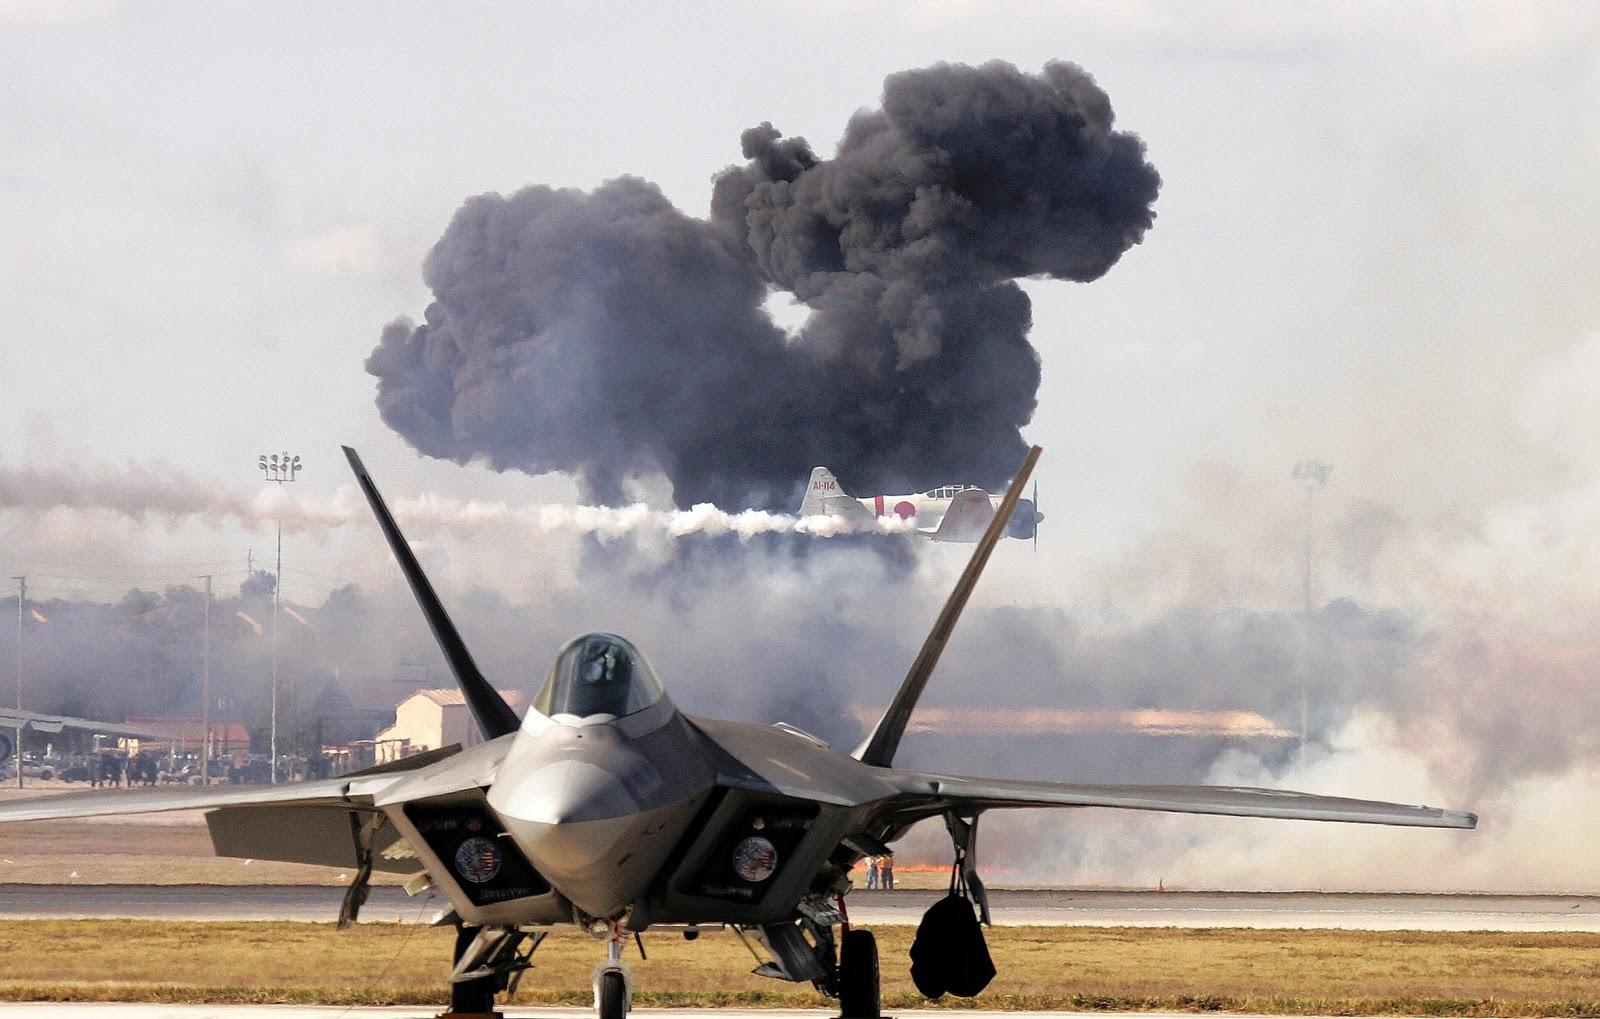 http://1.bp.blogspot.com/-DIvUhygJ7aY/TniLKsry2zI/AAAAAAAAGVA/sdbq3KNKbIU/s1600/f22_raptor_battle_warfare.jpg